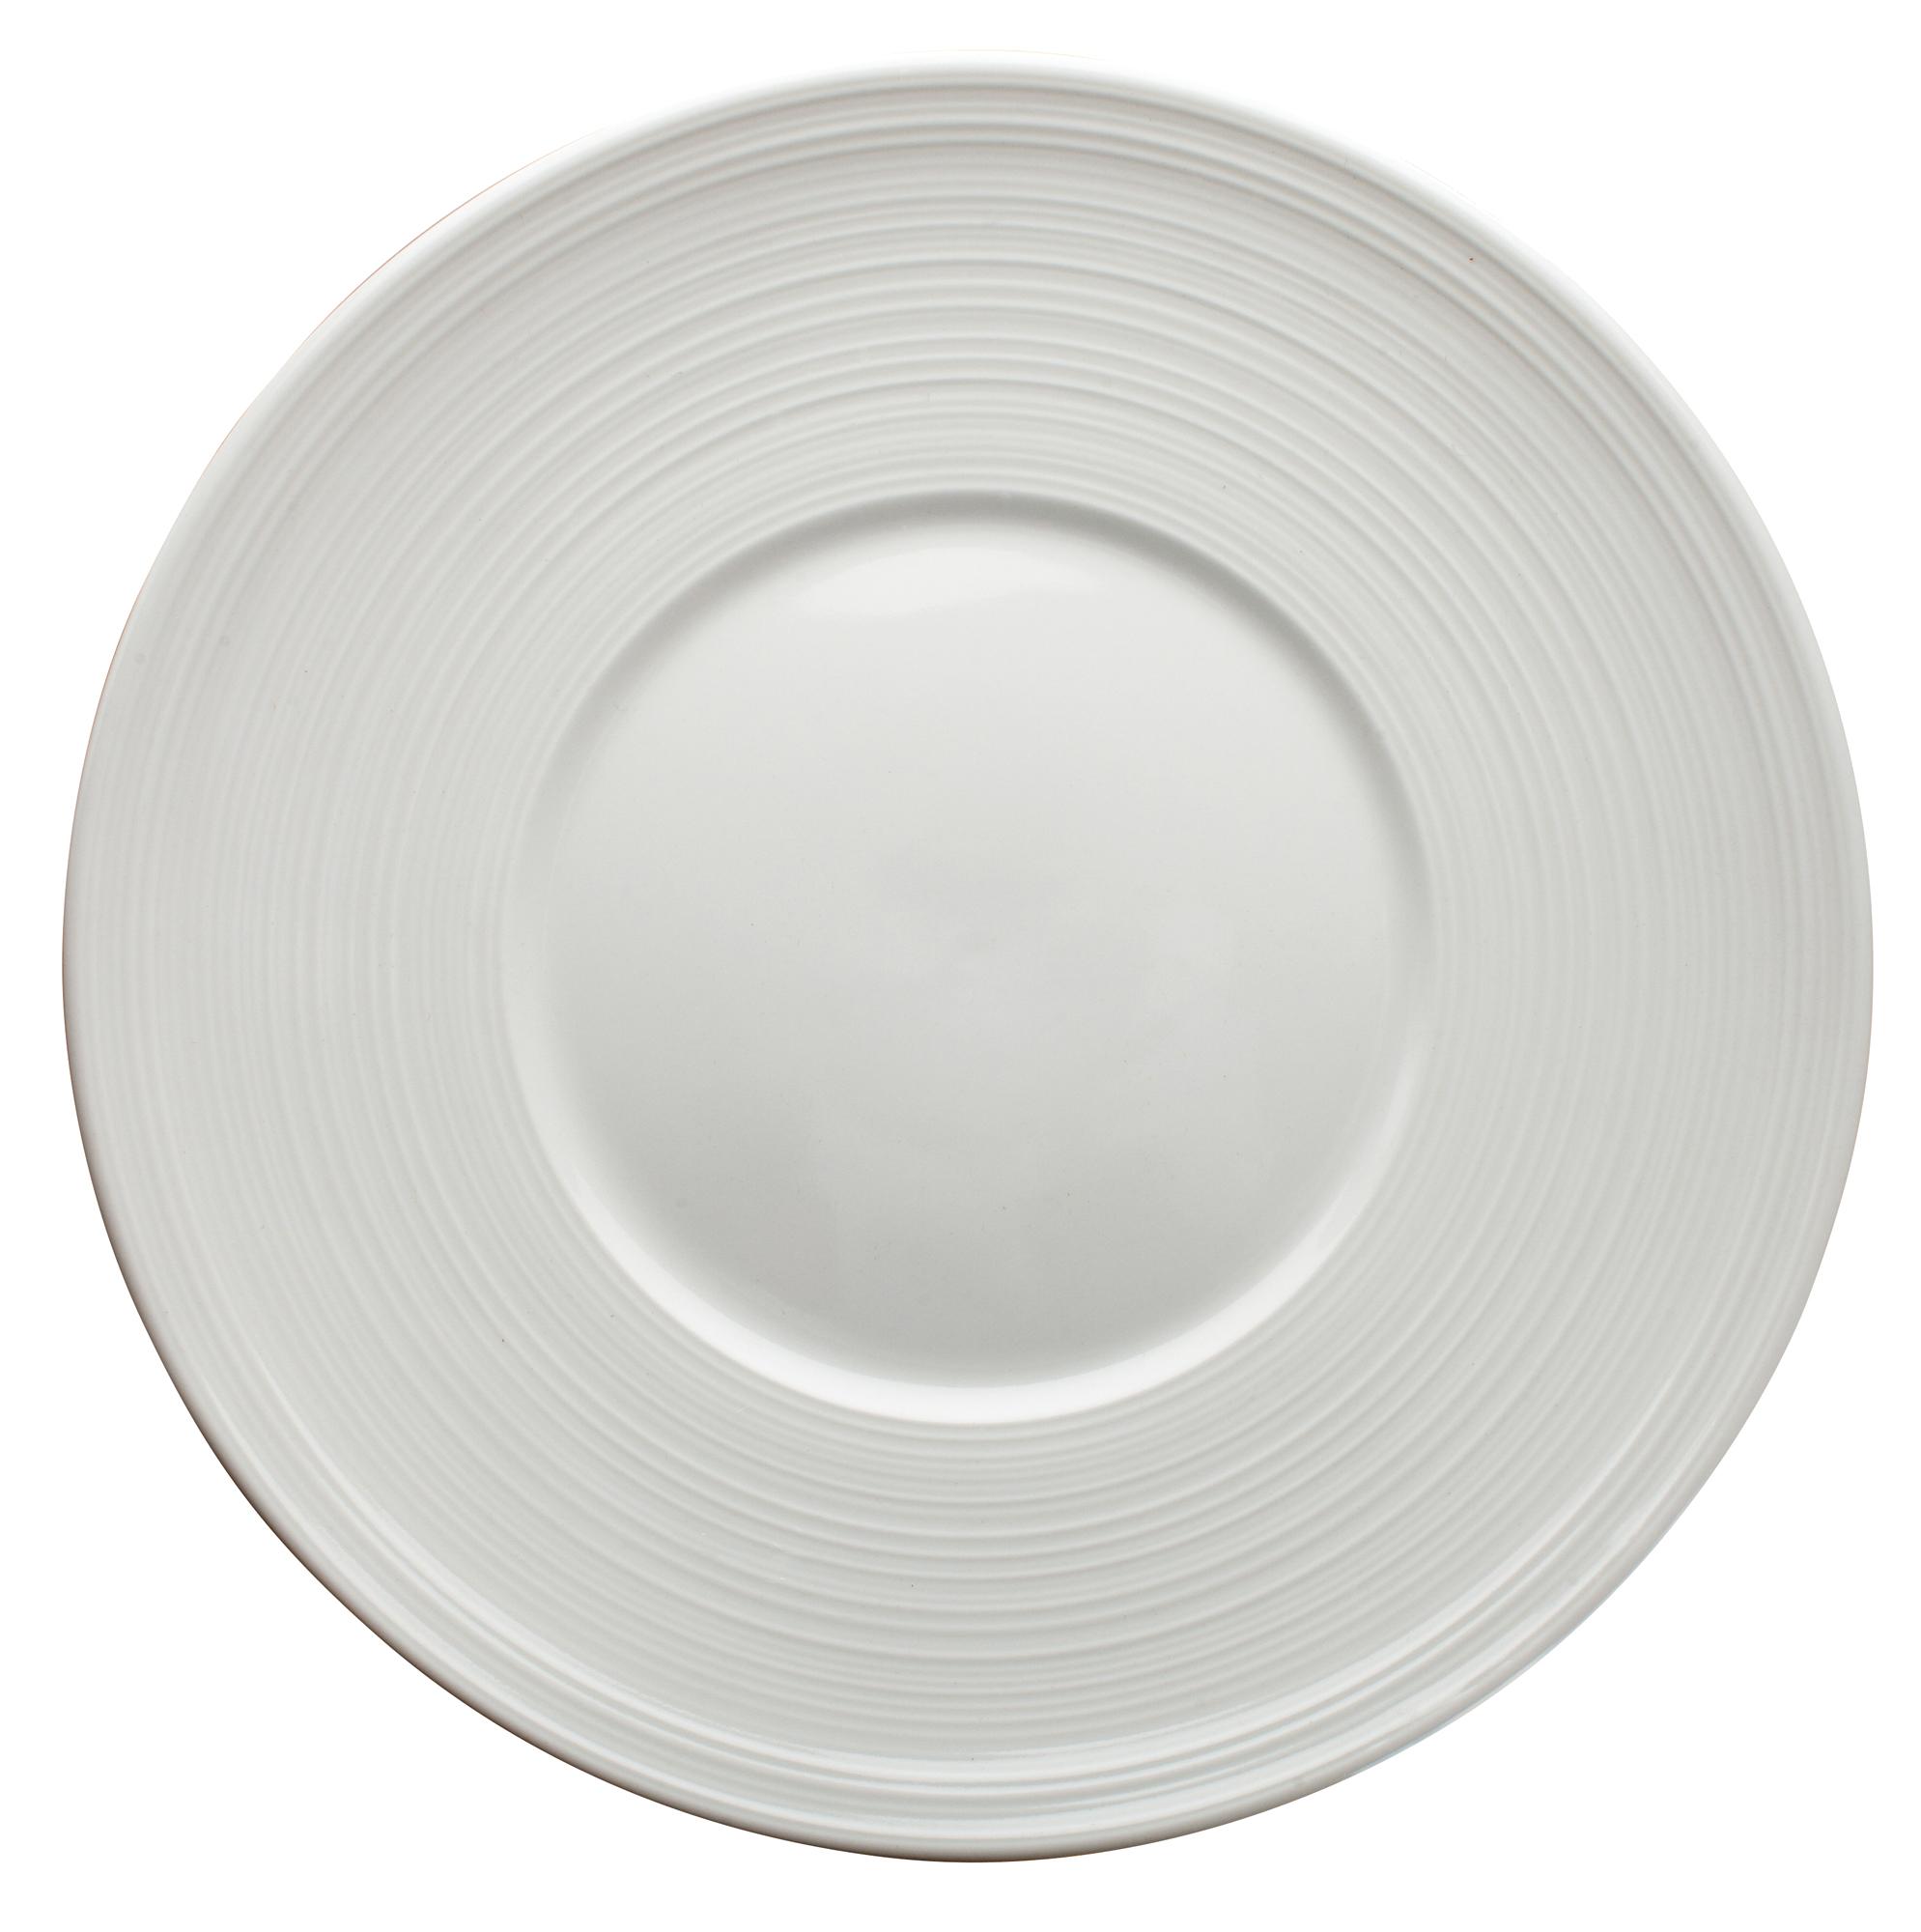 Winco WDP022-107 plate, china